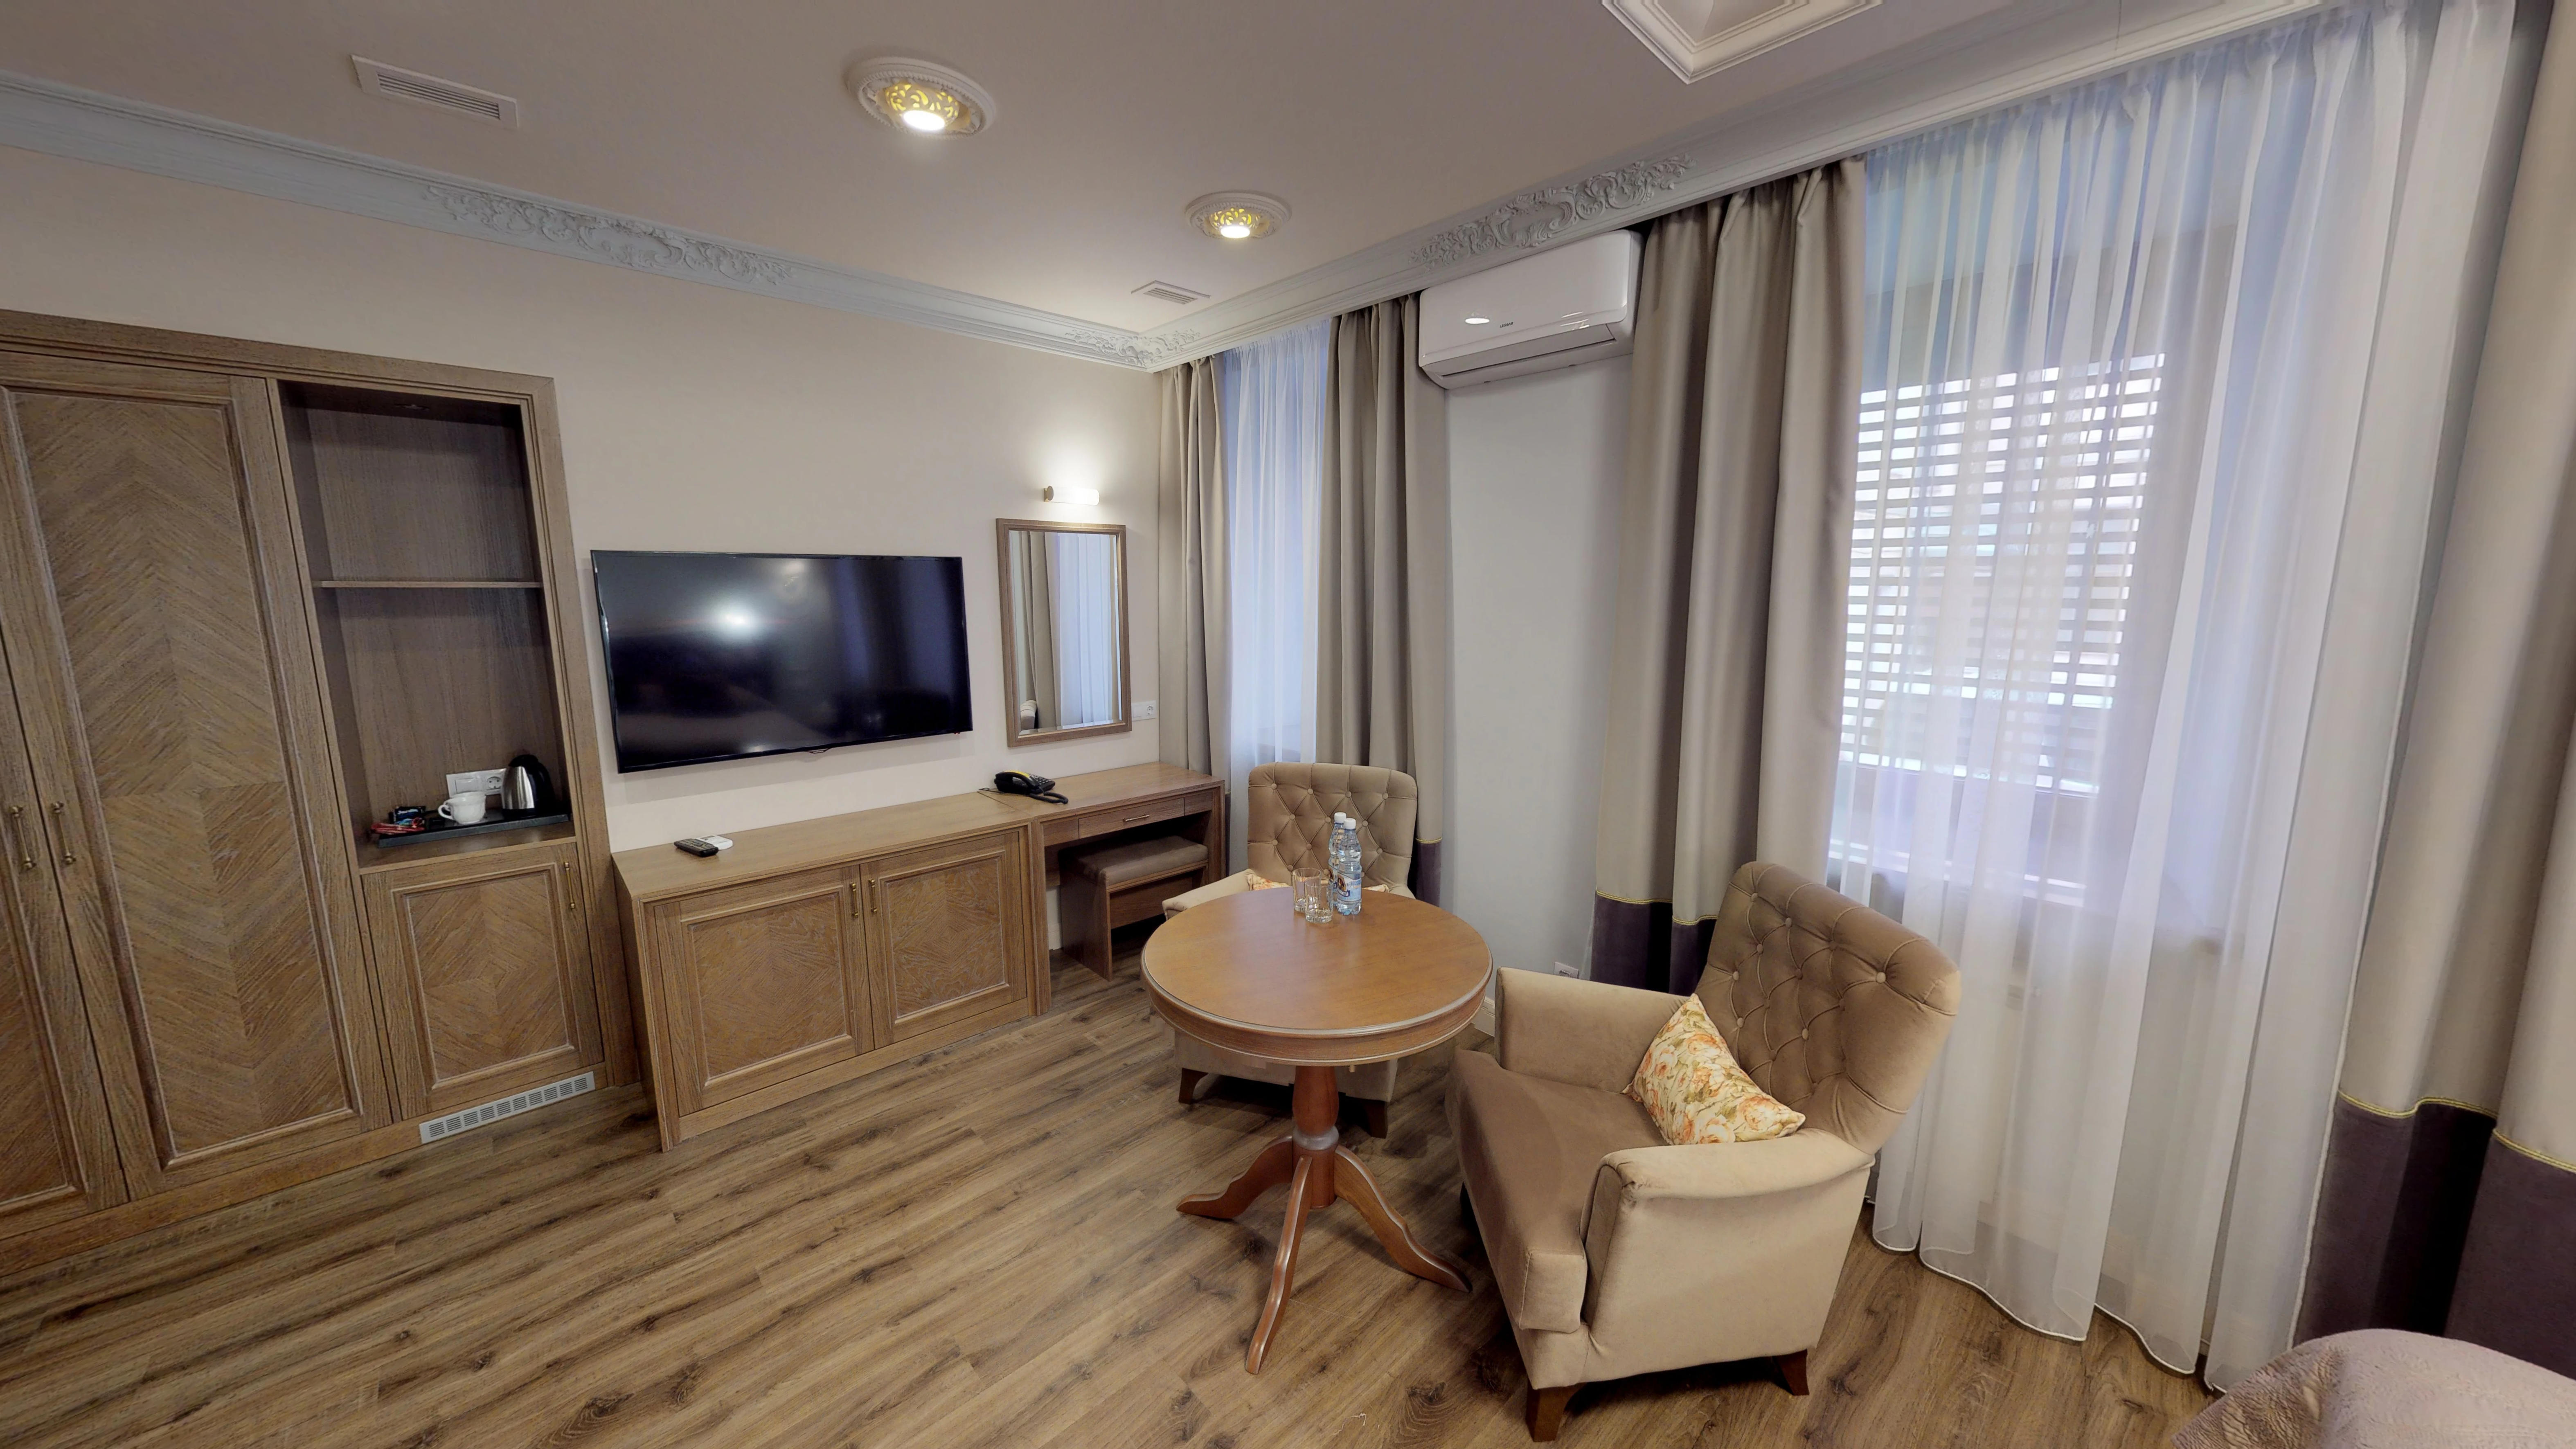 Коралловая комната в отеле Премиум